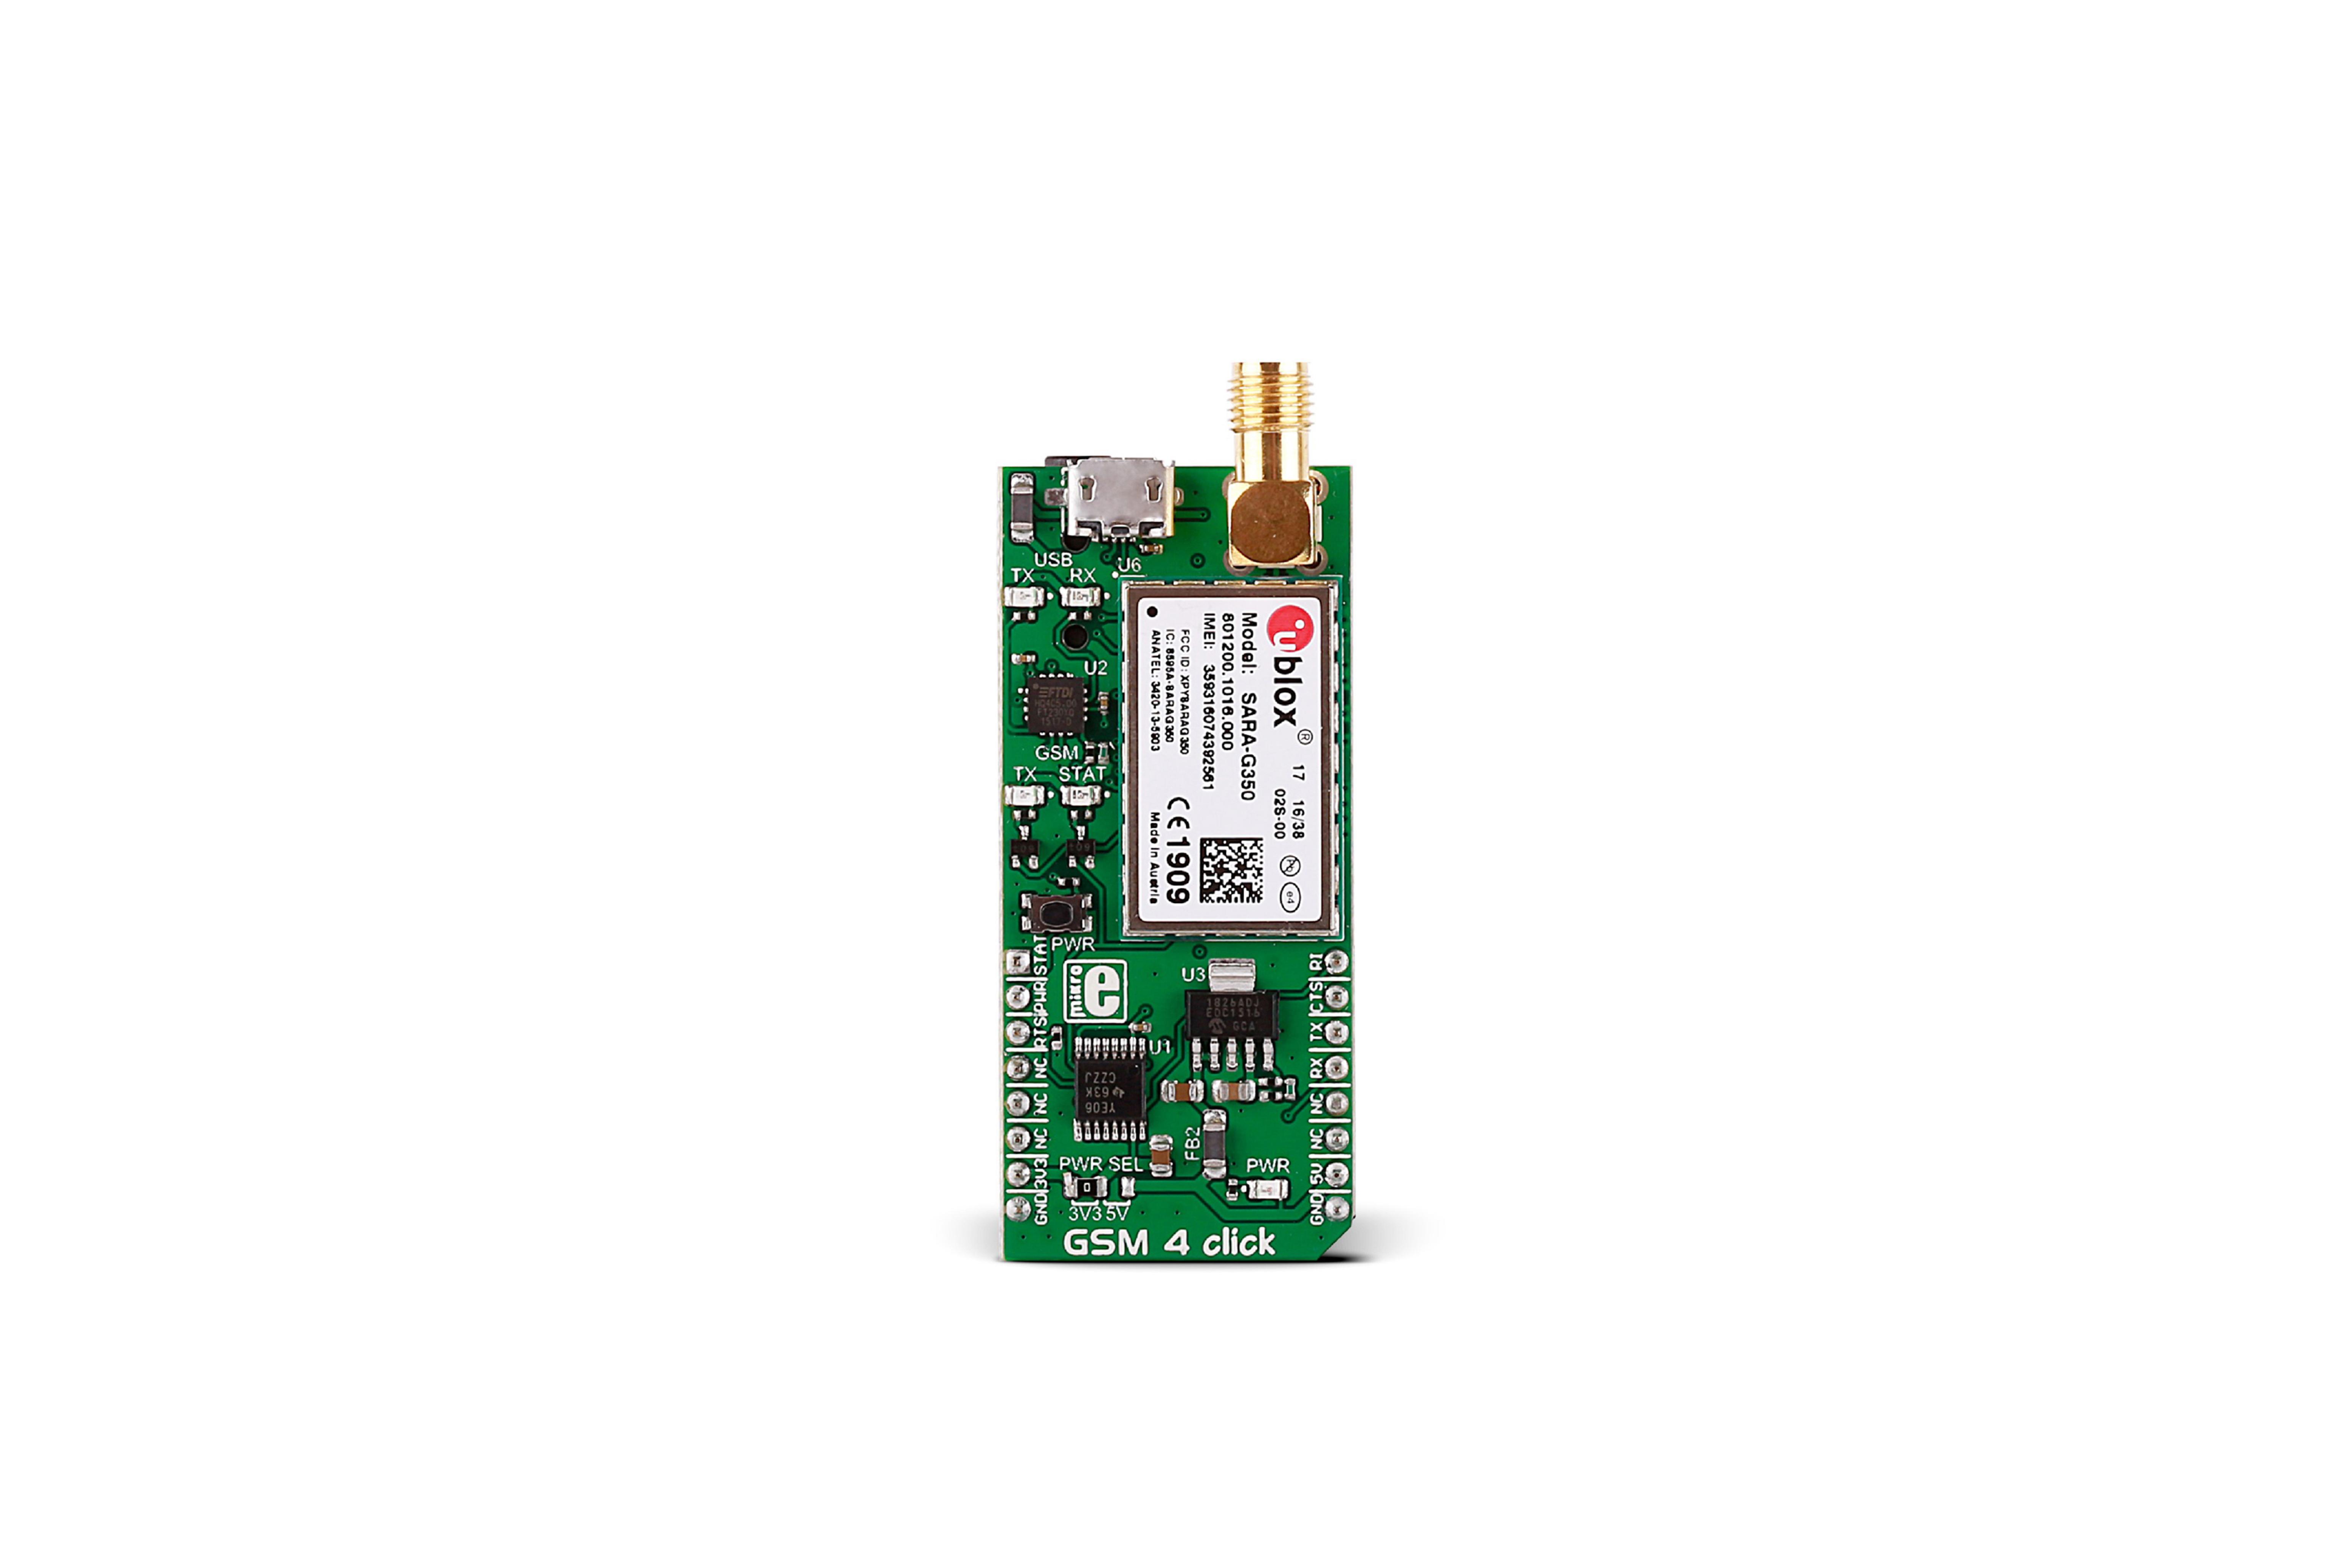 GSM 4 CLICK CELLULAR BOARD, MIKROE-2388